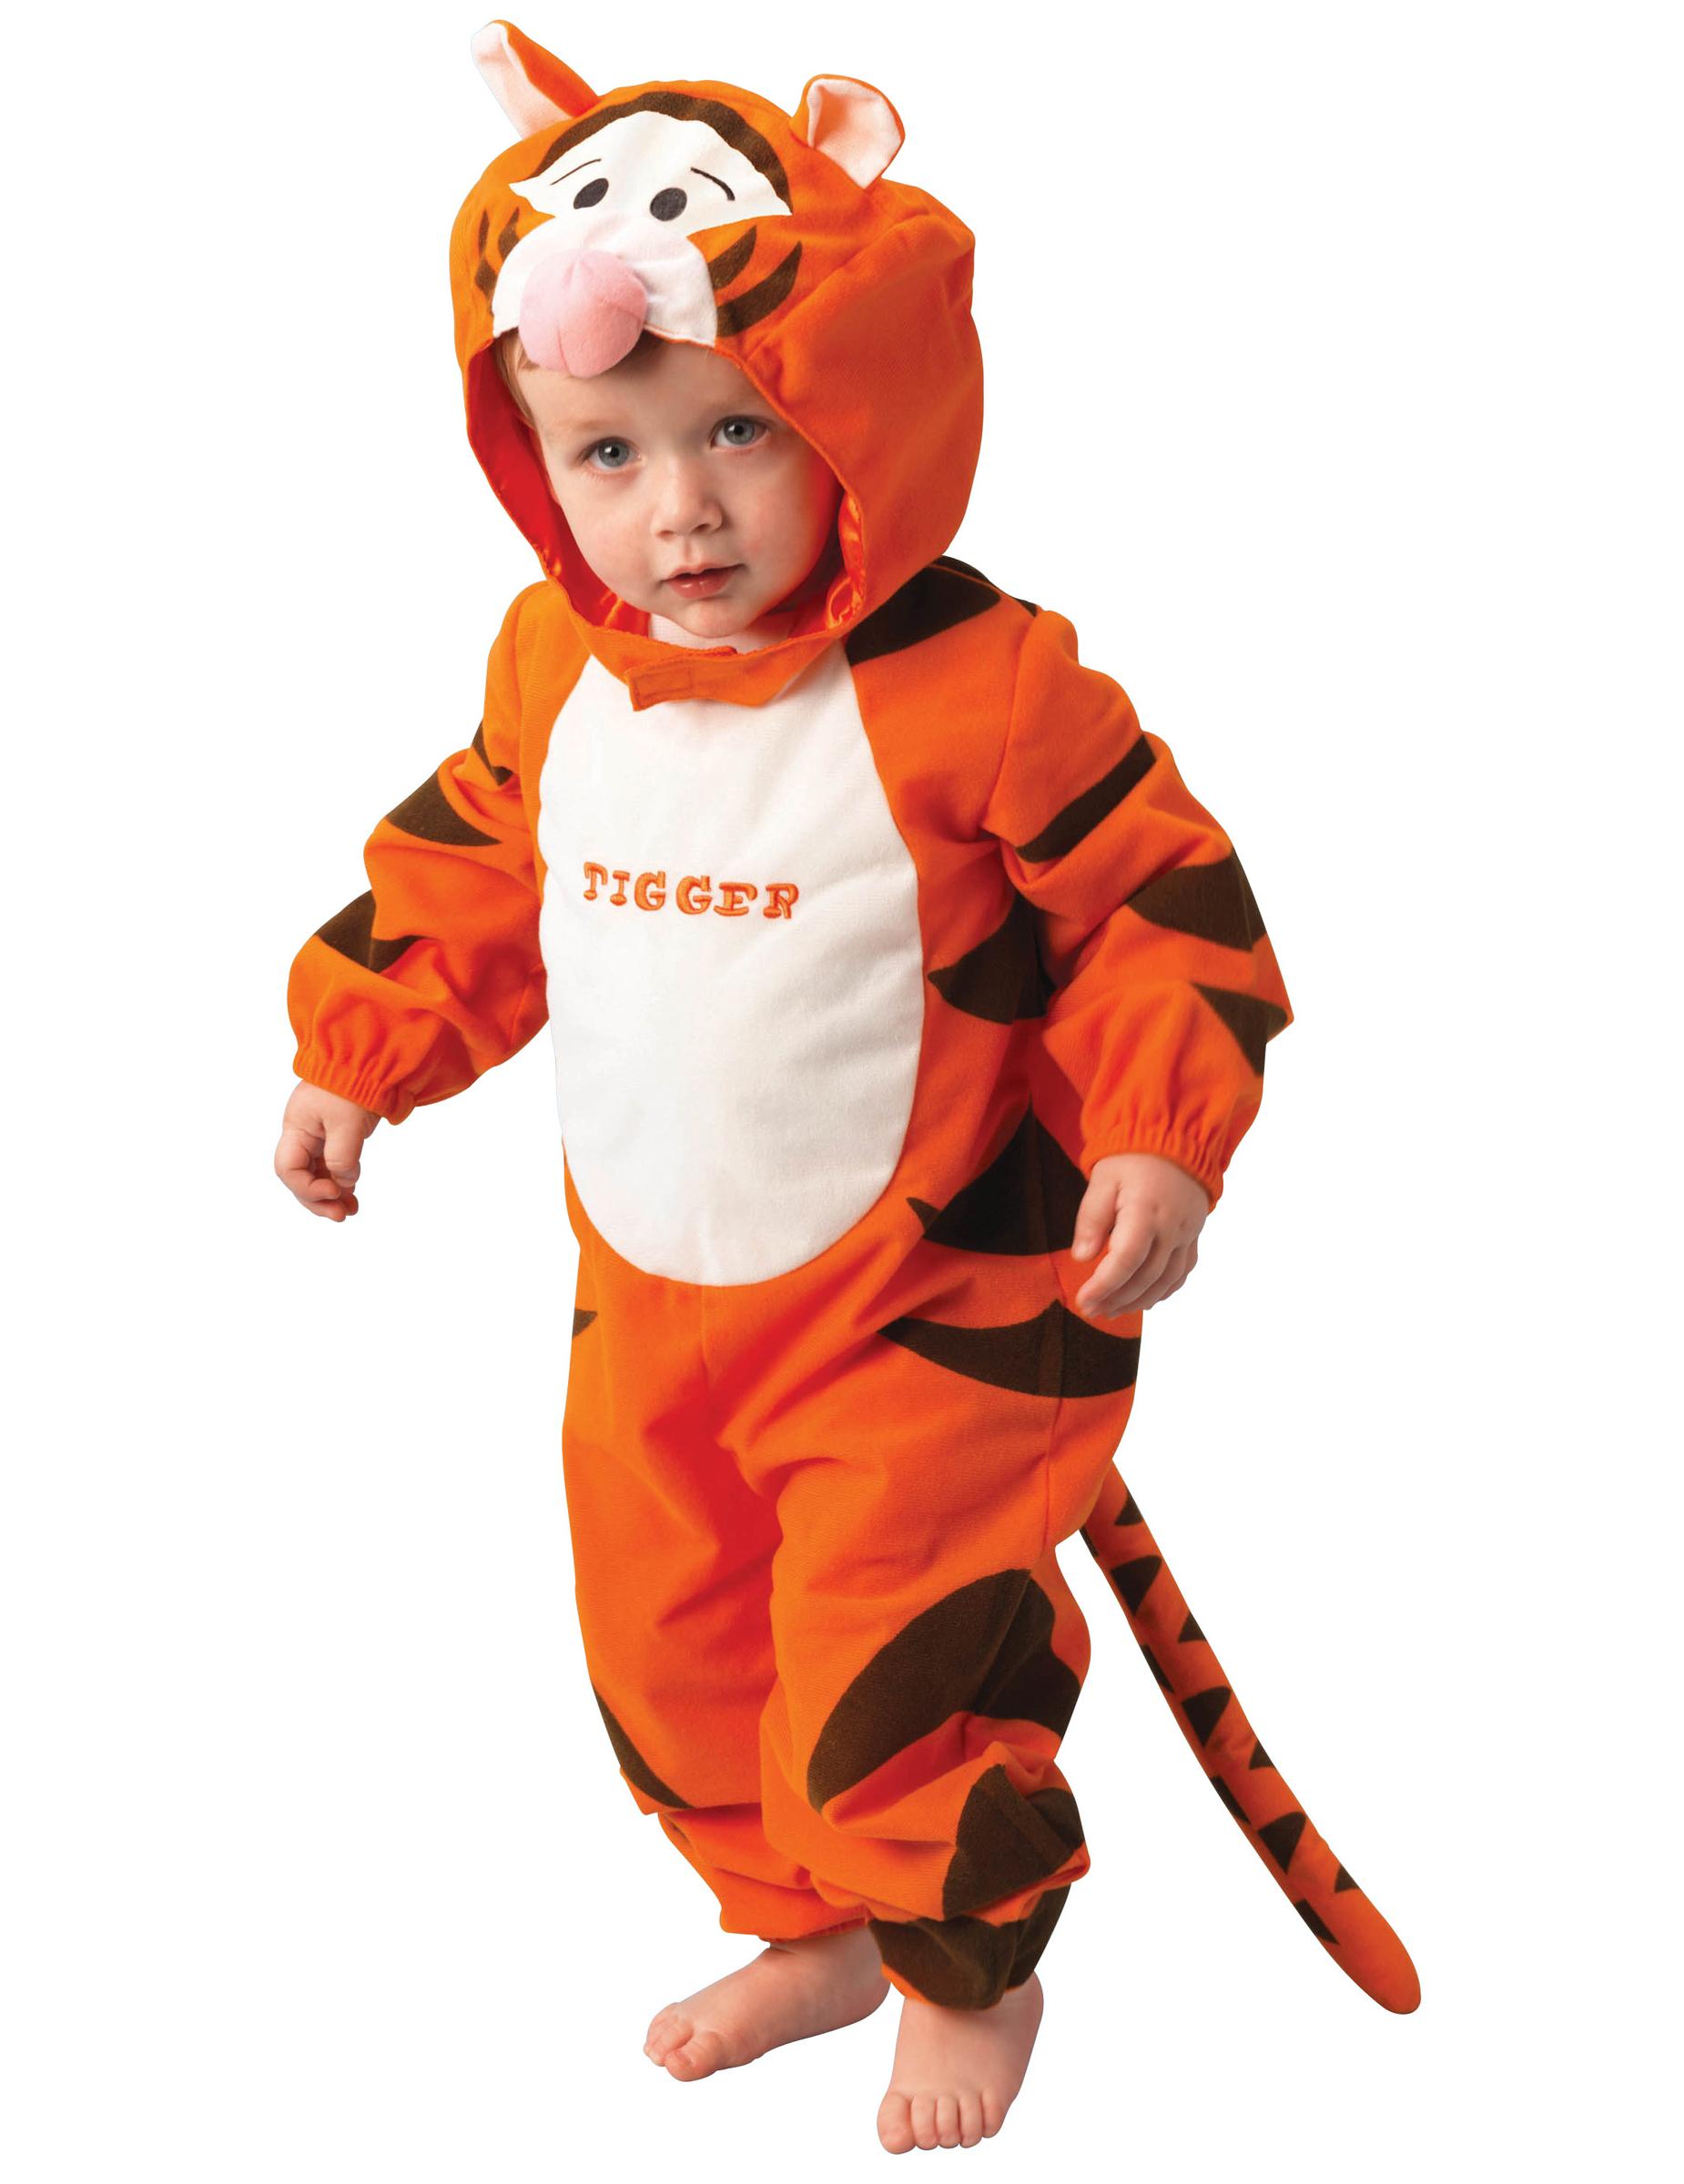 disney tigger babykost m lizenzware orange schwarz g nstige faschings kost me bei karneval. Black Bedroom Furniture Sets. Home Design Ideas